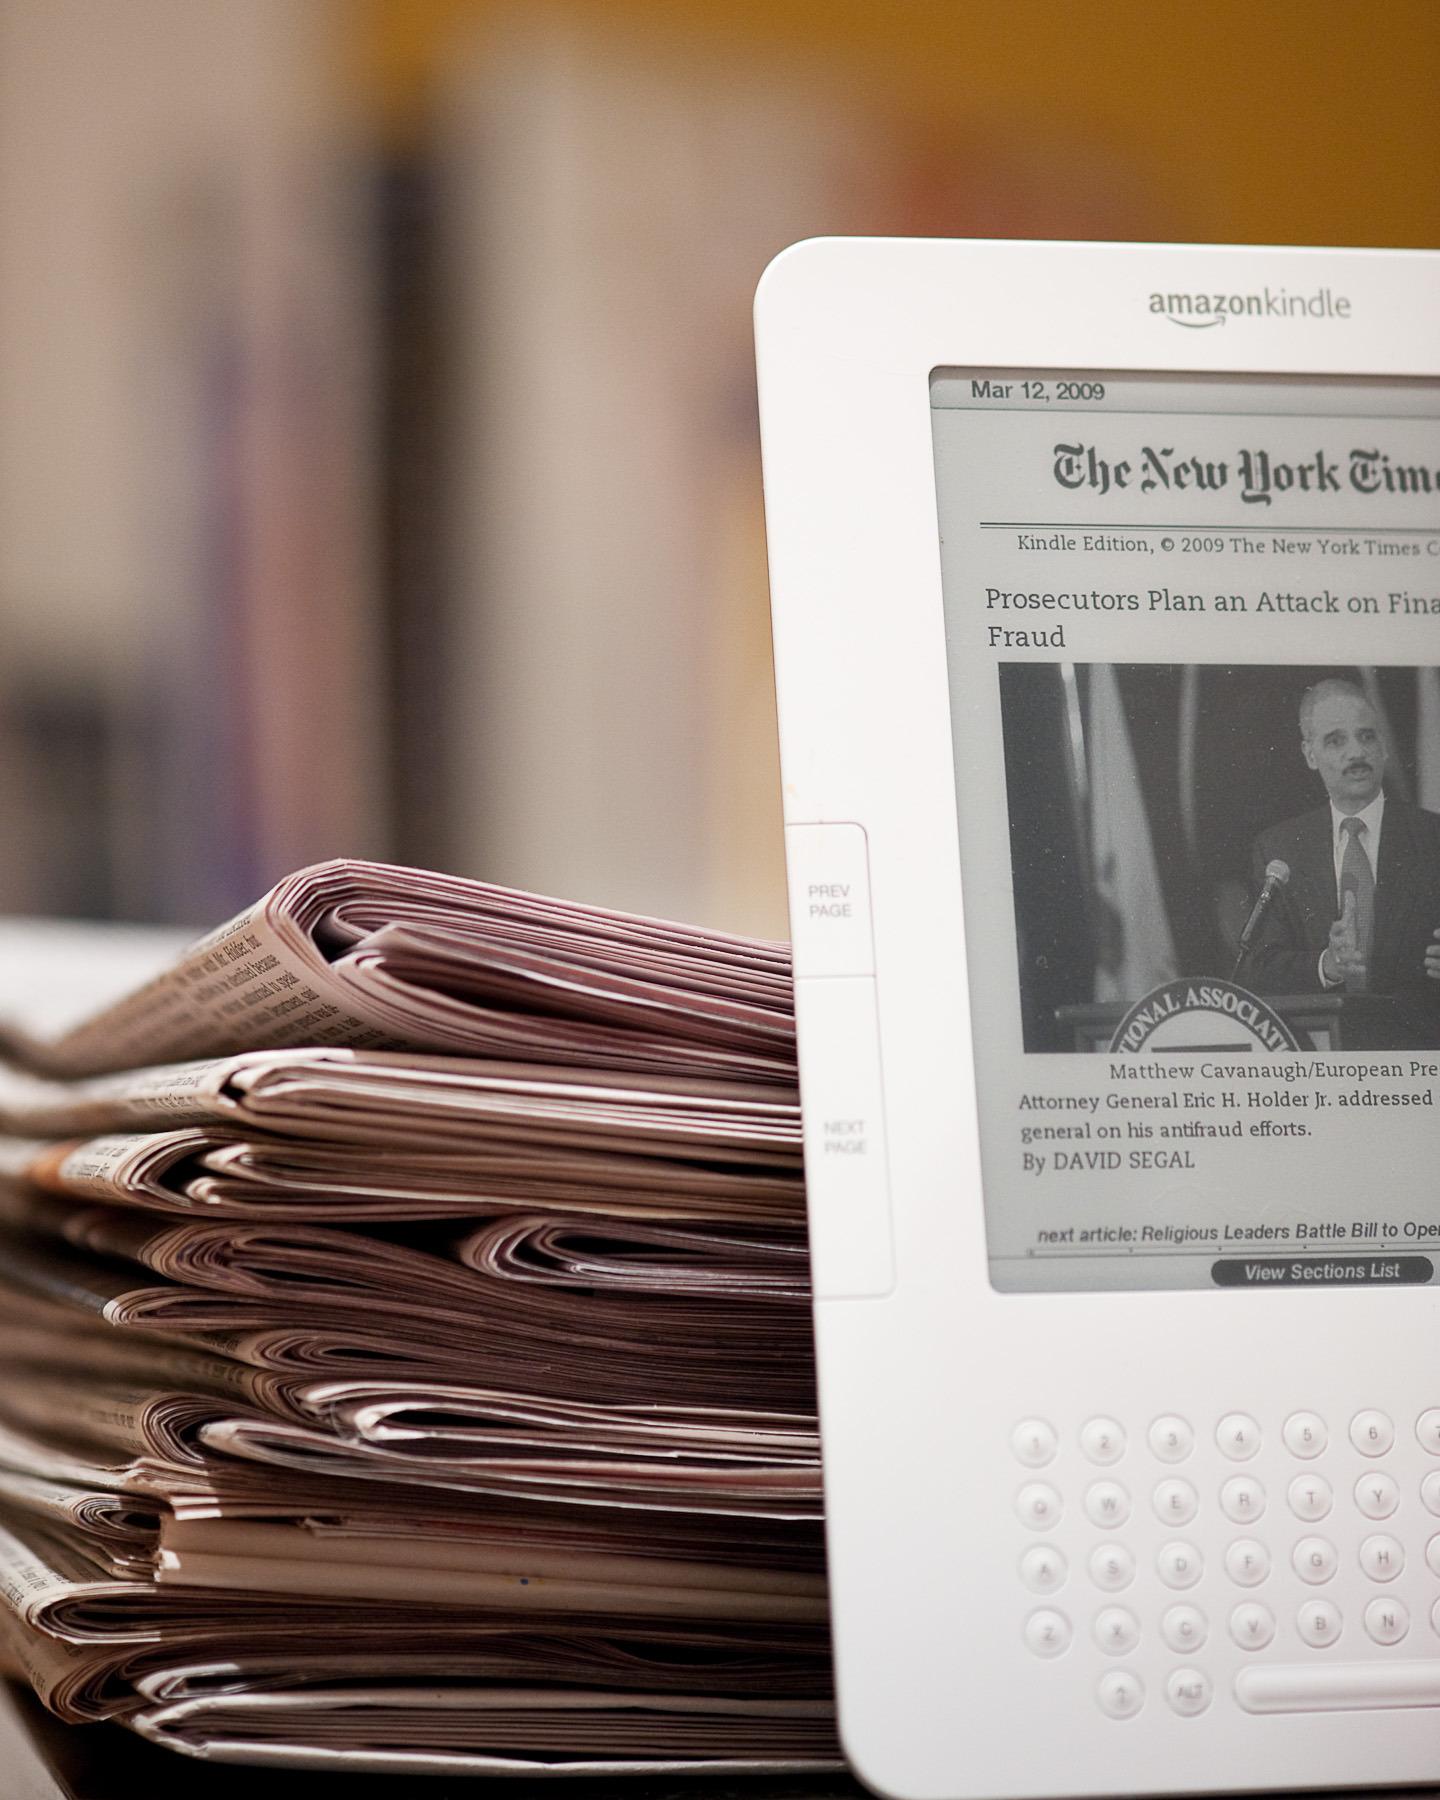 The Kindle New York Times